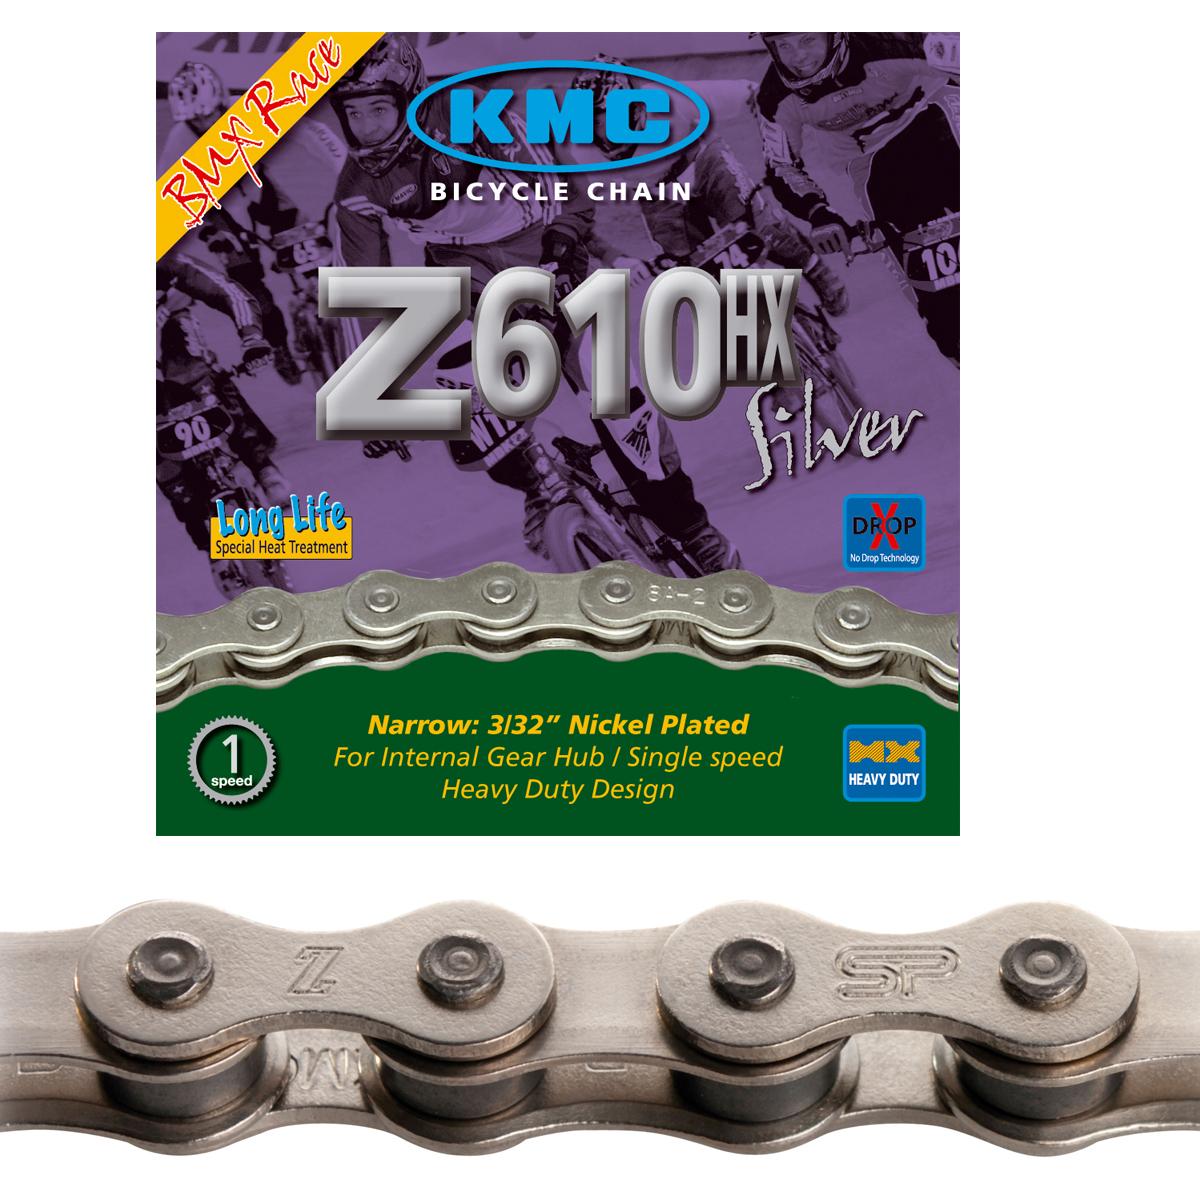 Chaîne BMX KMC Z610HX Silver 112 maillons